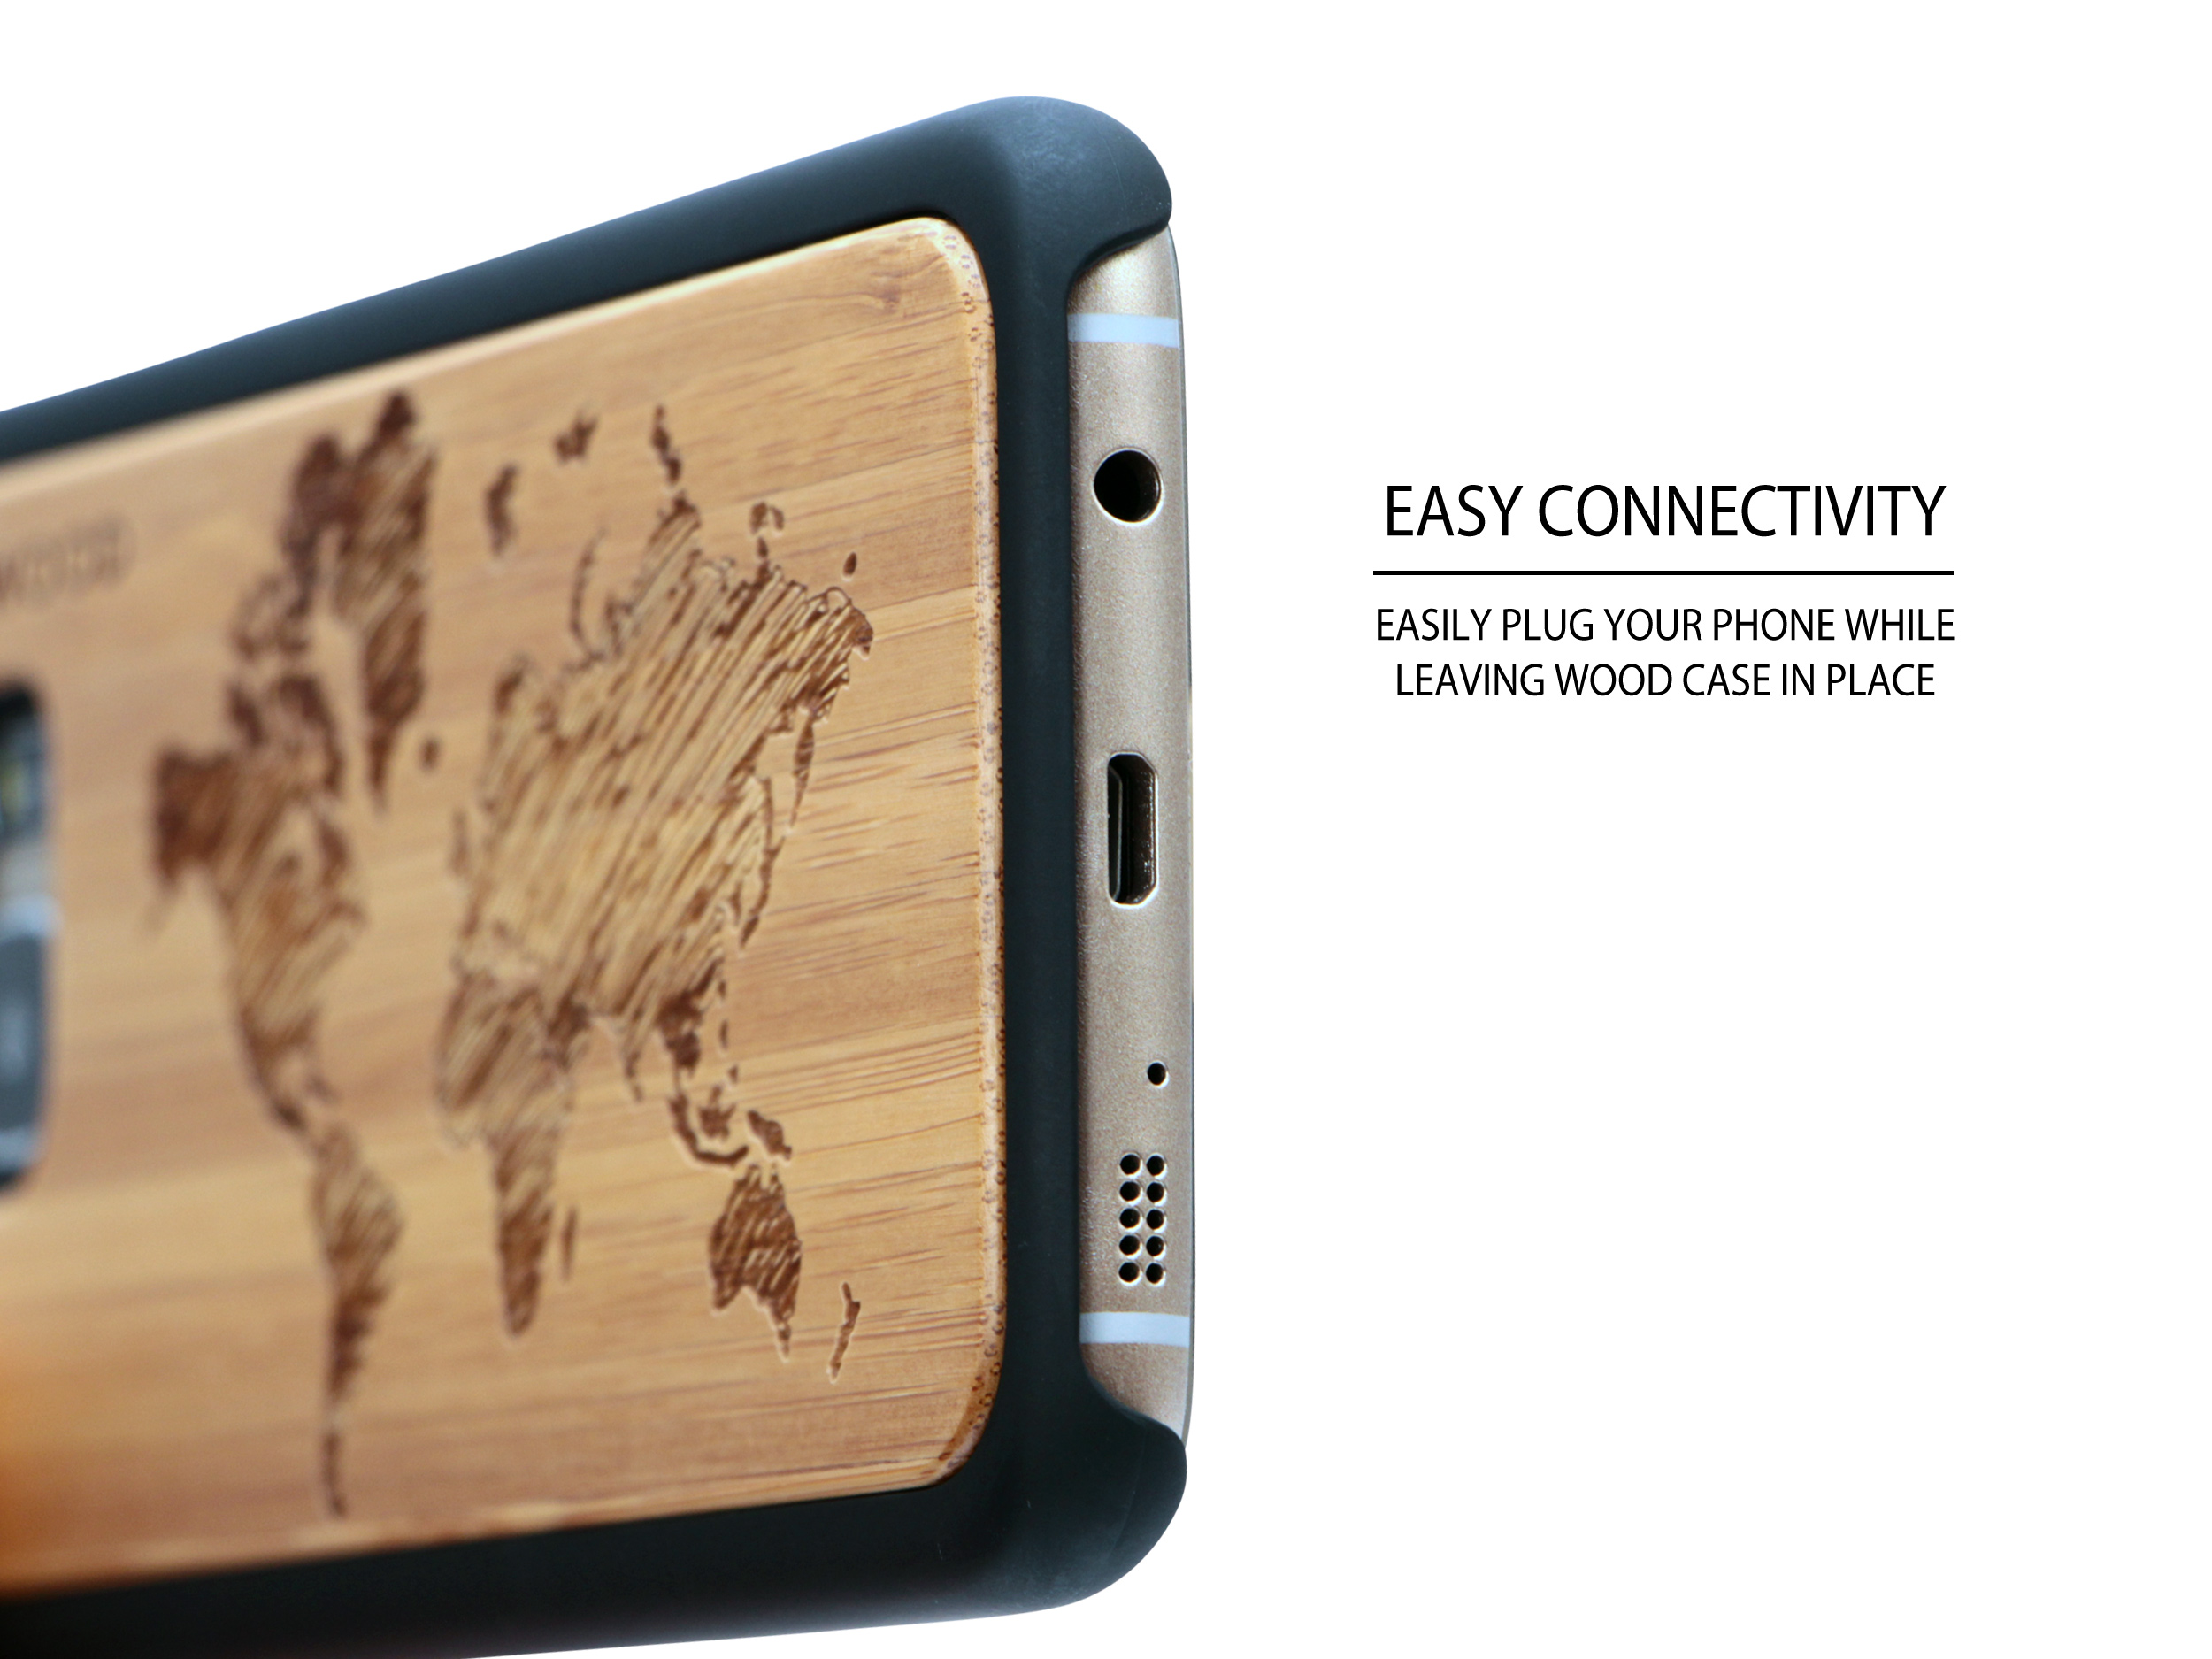 Samsung Galaxy S7 Edge wood case world map socket